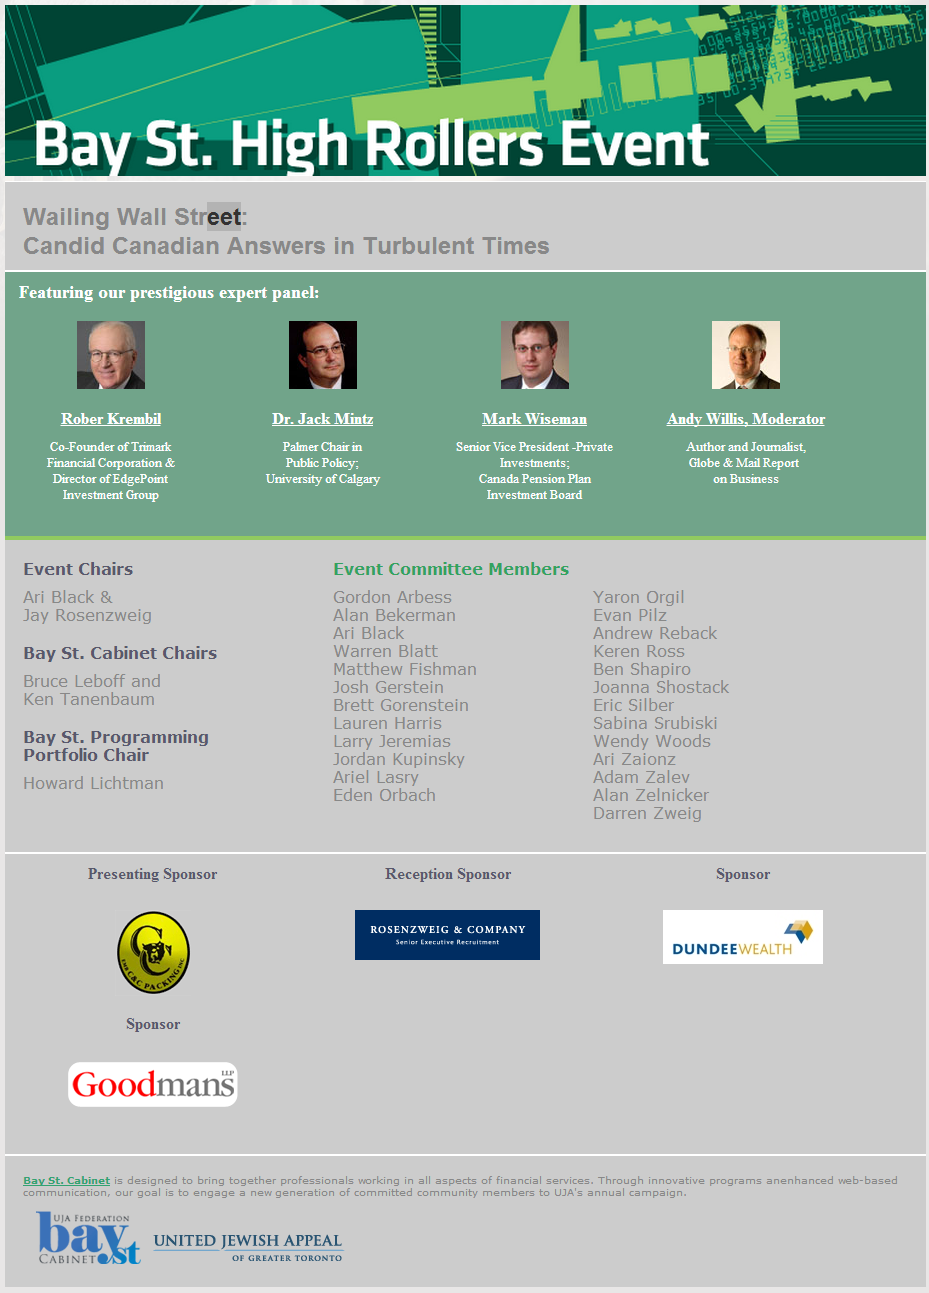 Rosenzweig Sponsors Economic Panel